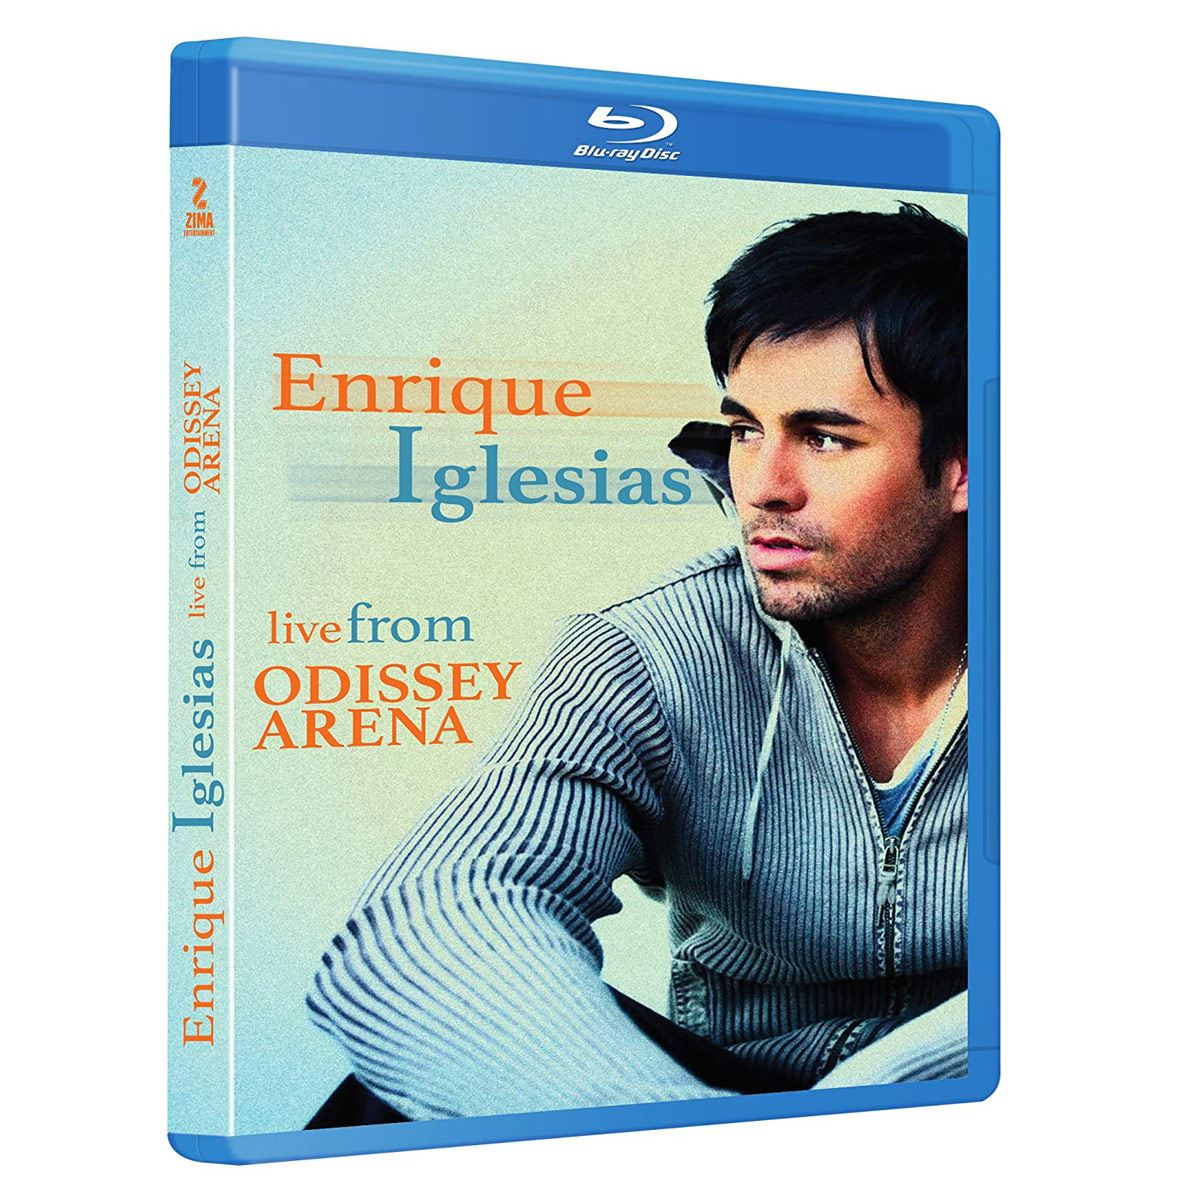 BR Enrique Iglesias Live